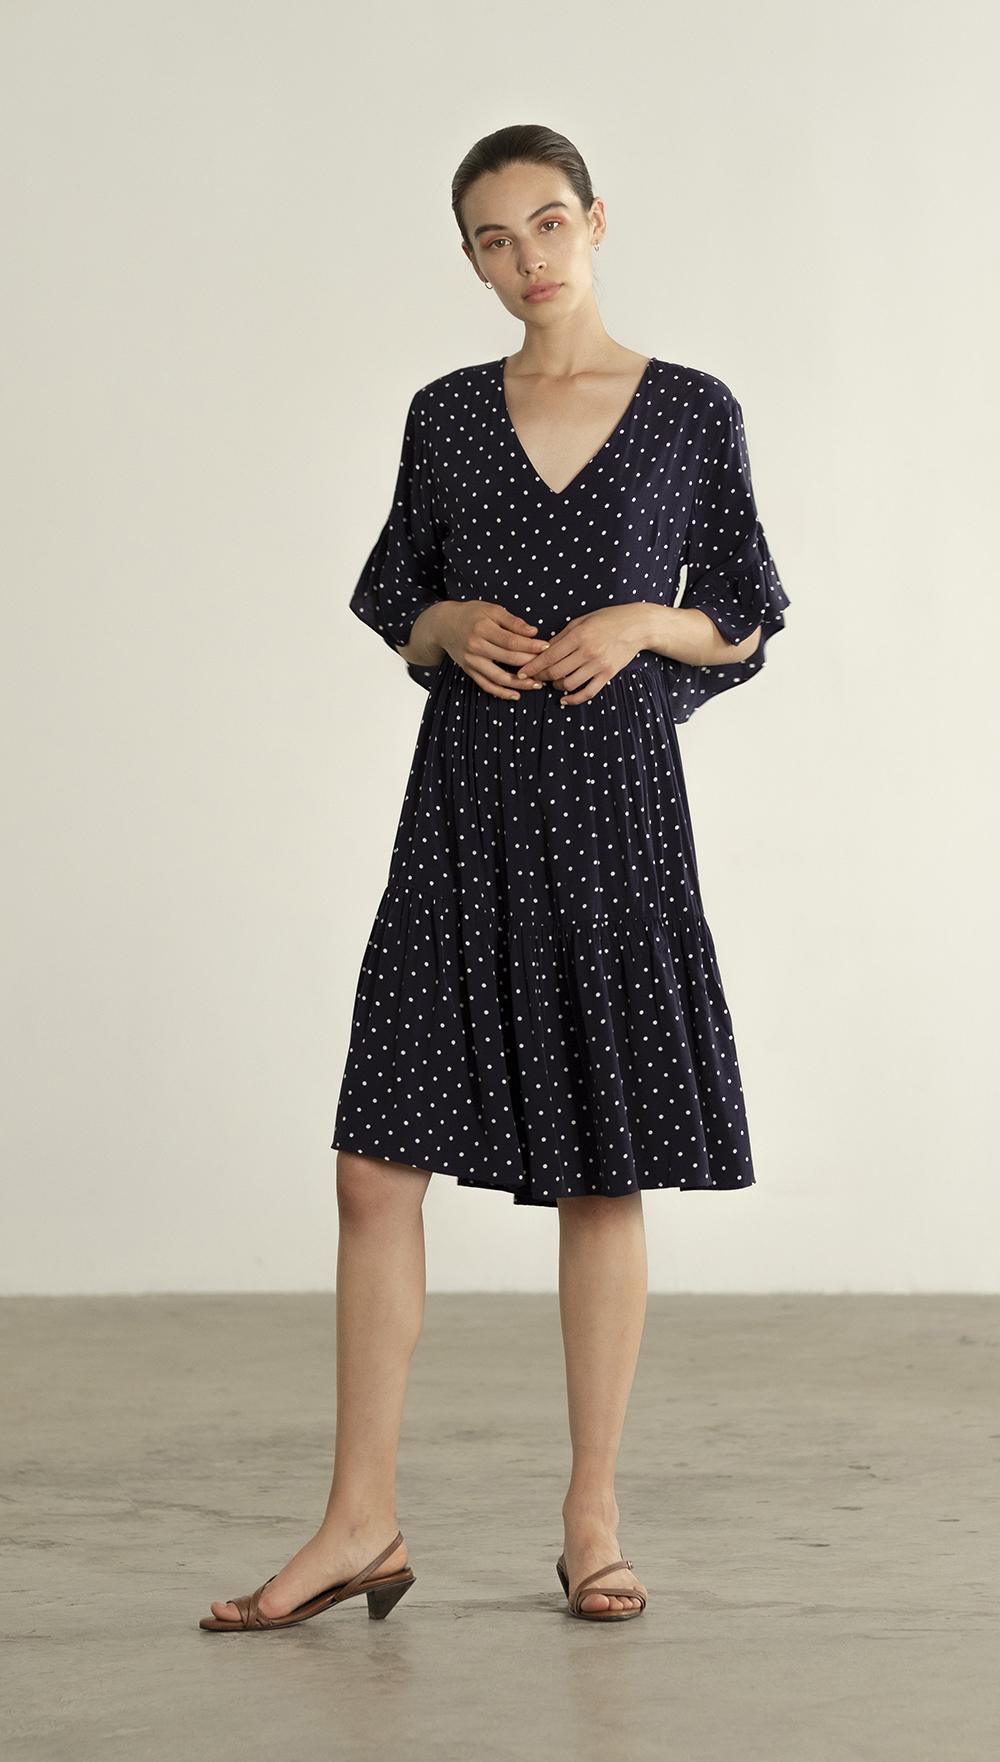 Maria Stanley Spring 2019 Gayle dress cupro navy polka dot 05